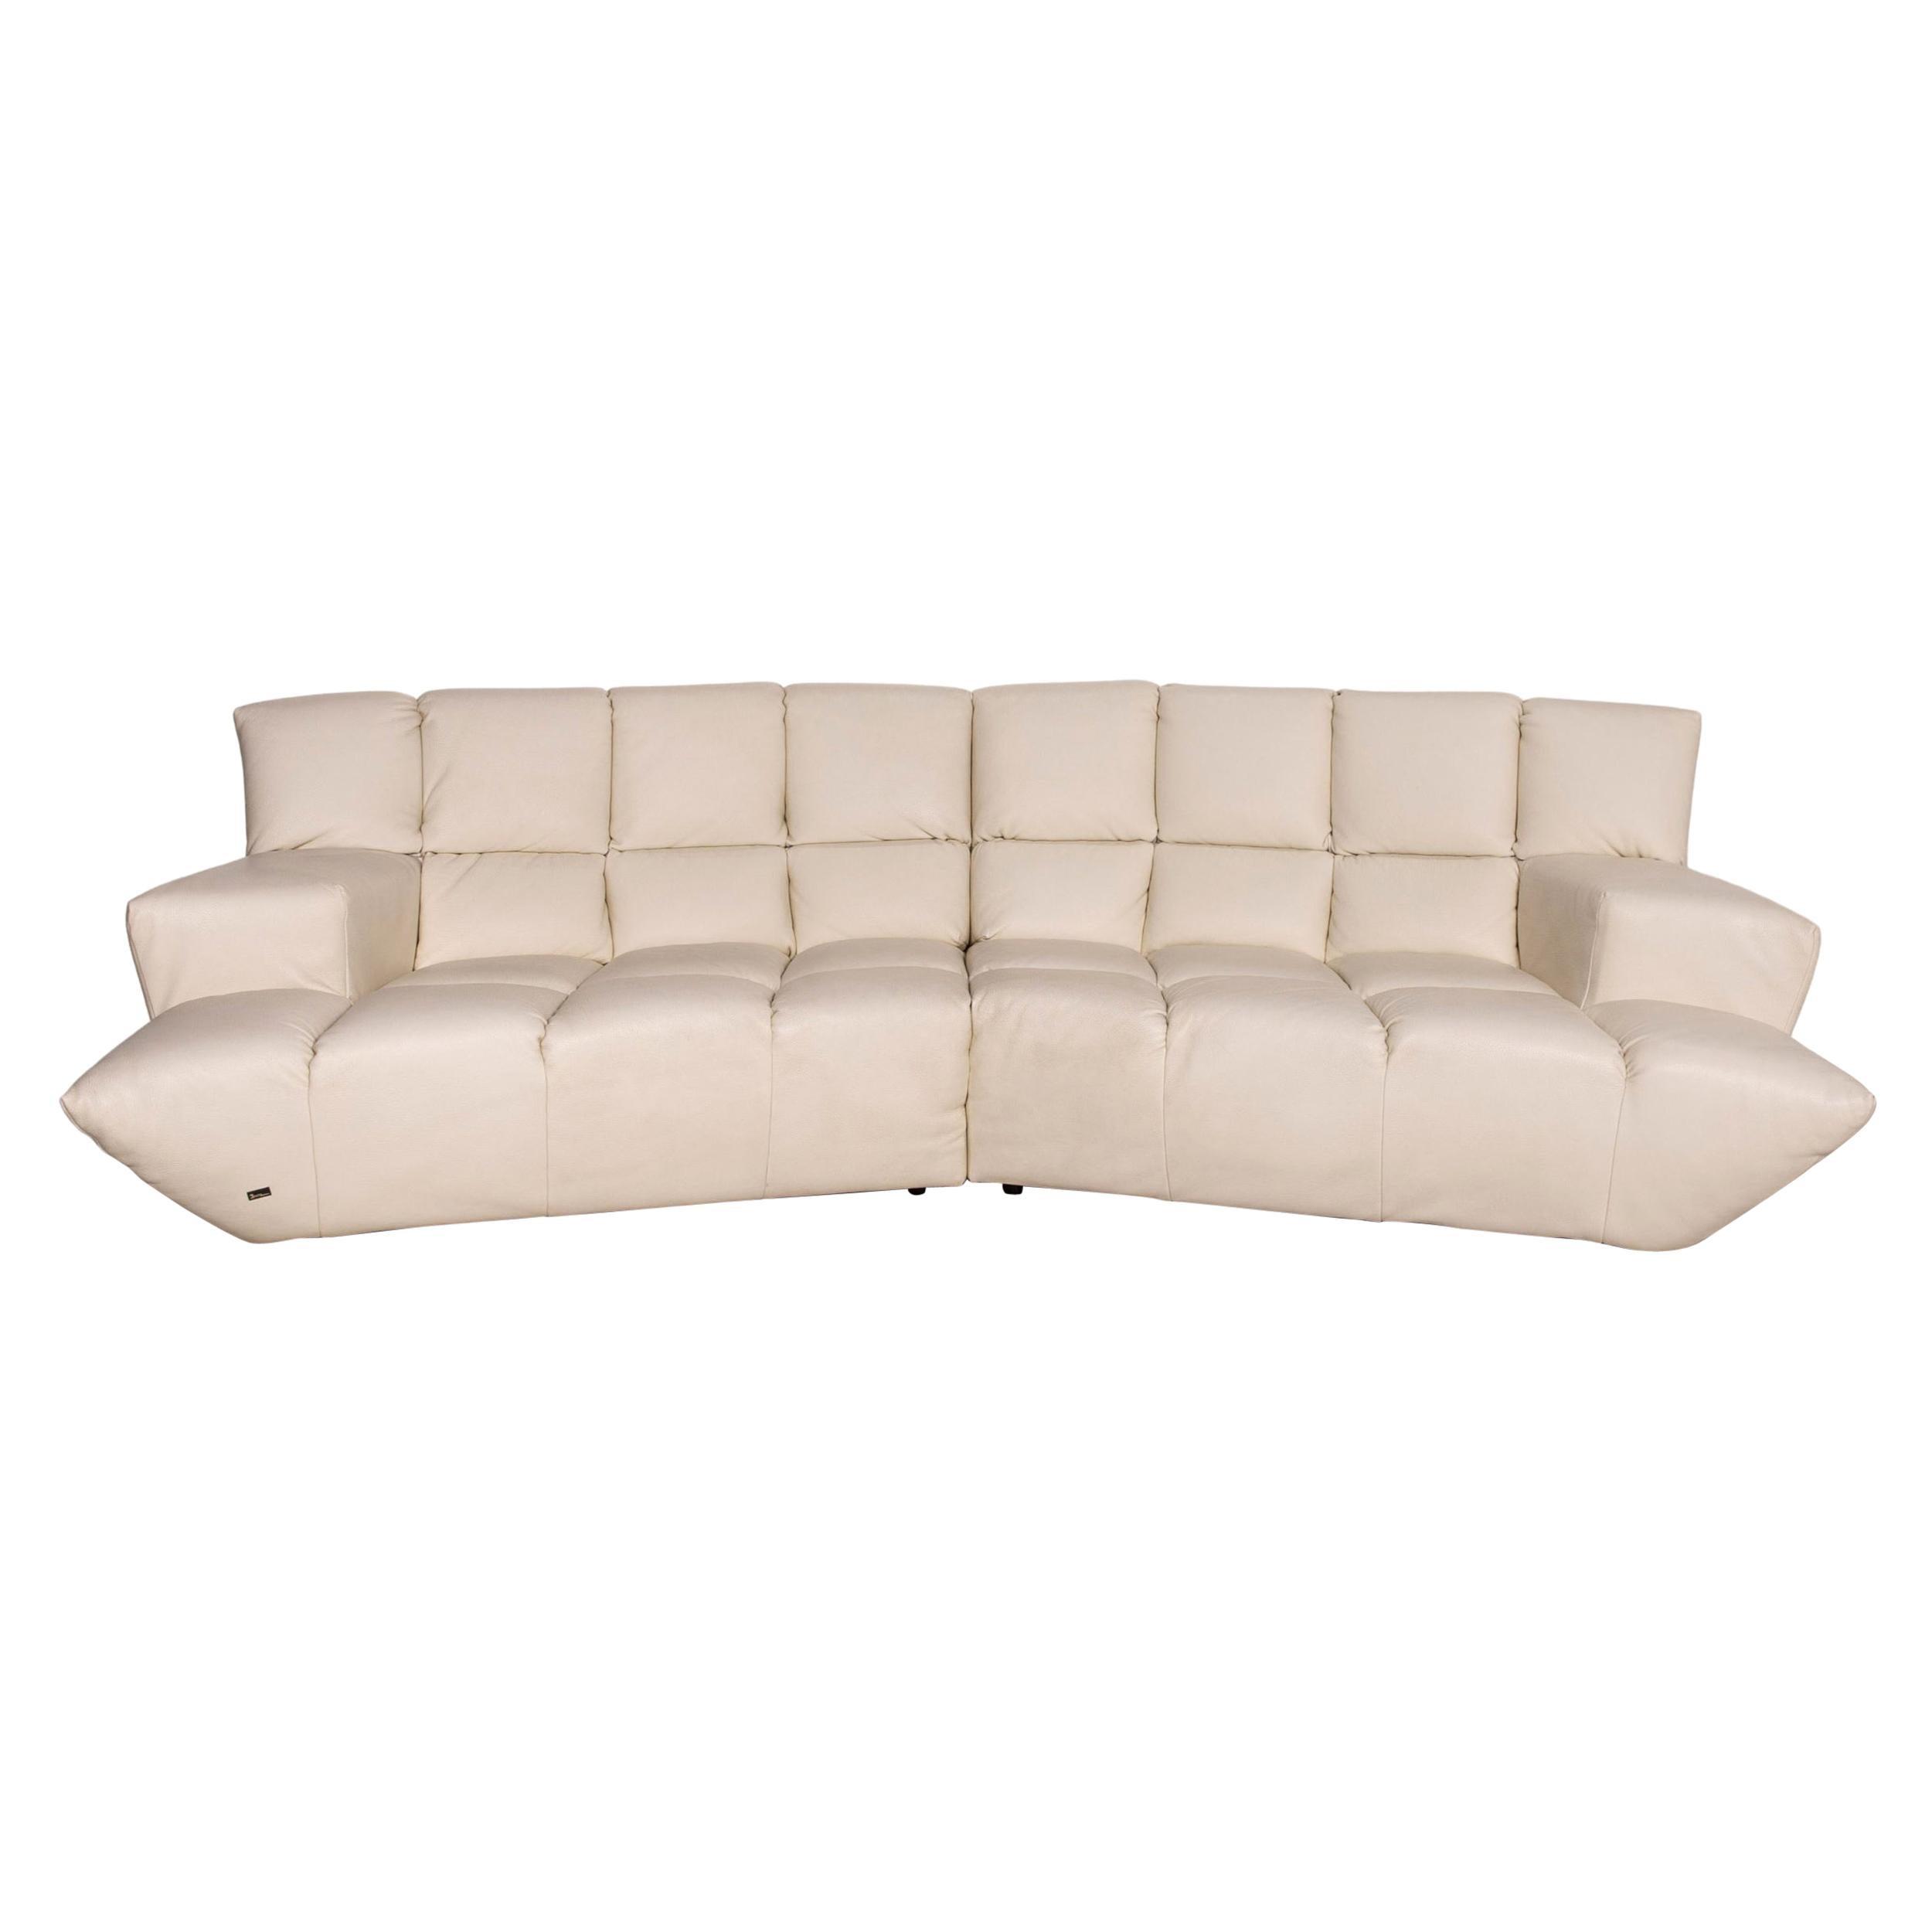 Bretz Cloud 7 Leather Corner Sofa Cream Couch